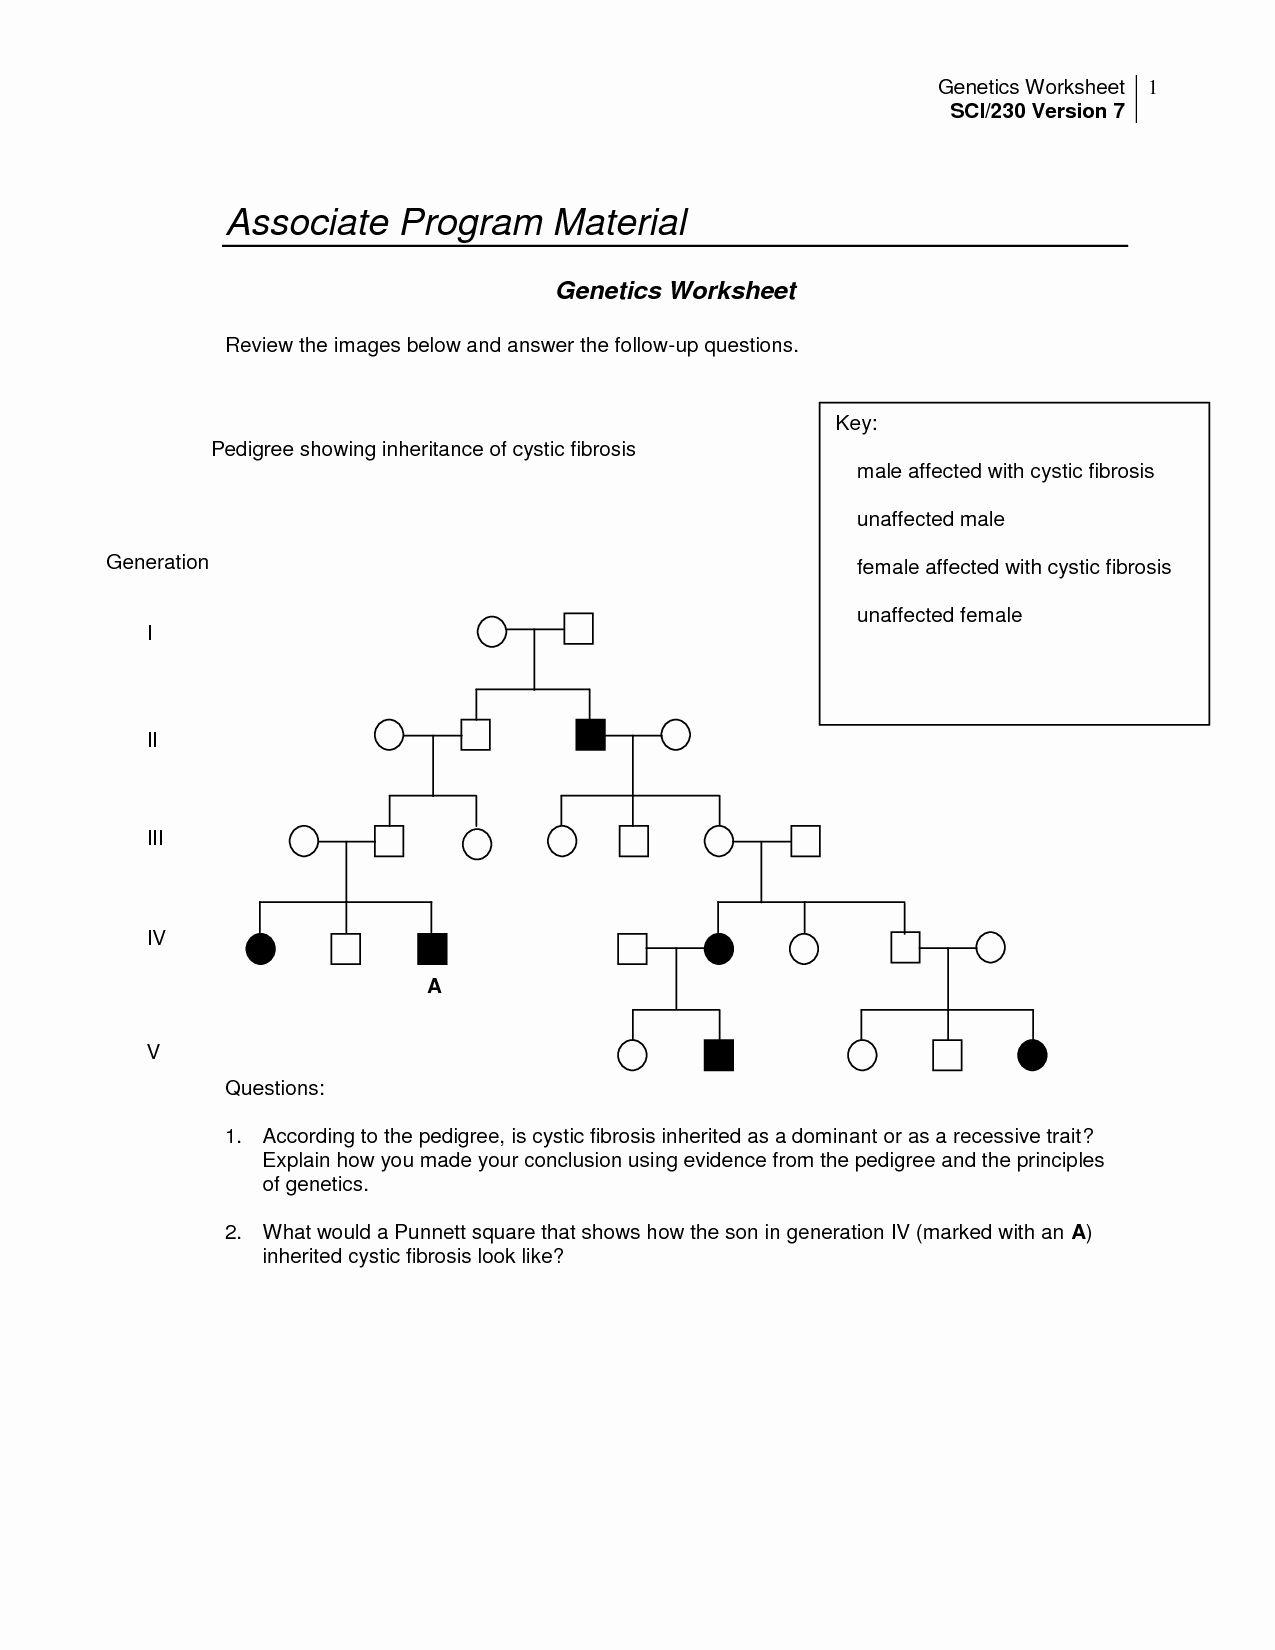 Genetics Pedigree Worksheet Answers Awesome 14 Best Of